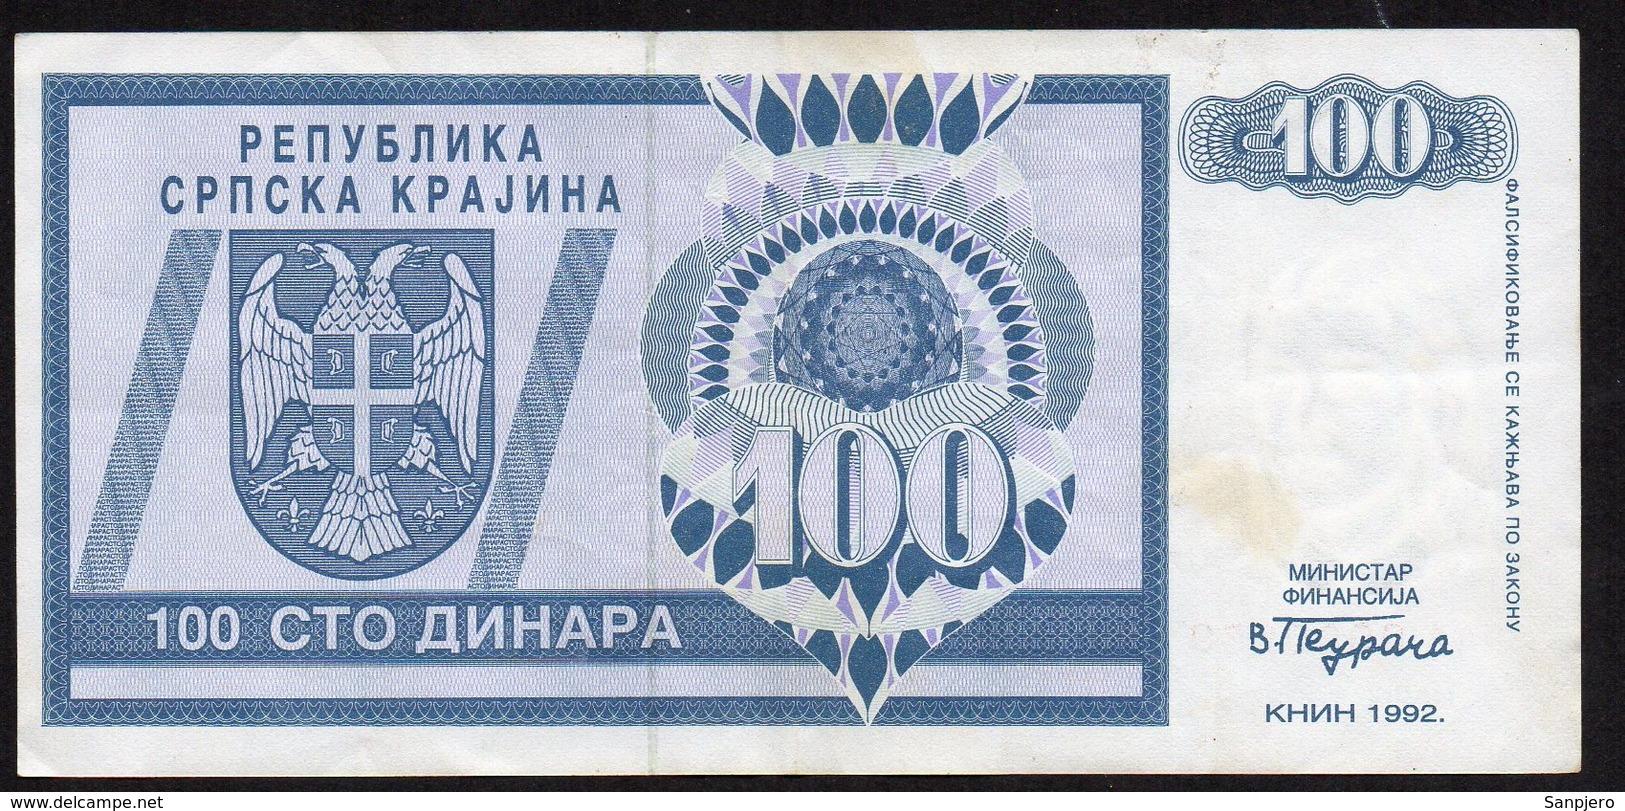 CROATIA OCUPATION 1992. SRPSKA KRAJINA 100 Dinara - Croatie